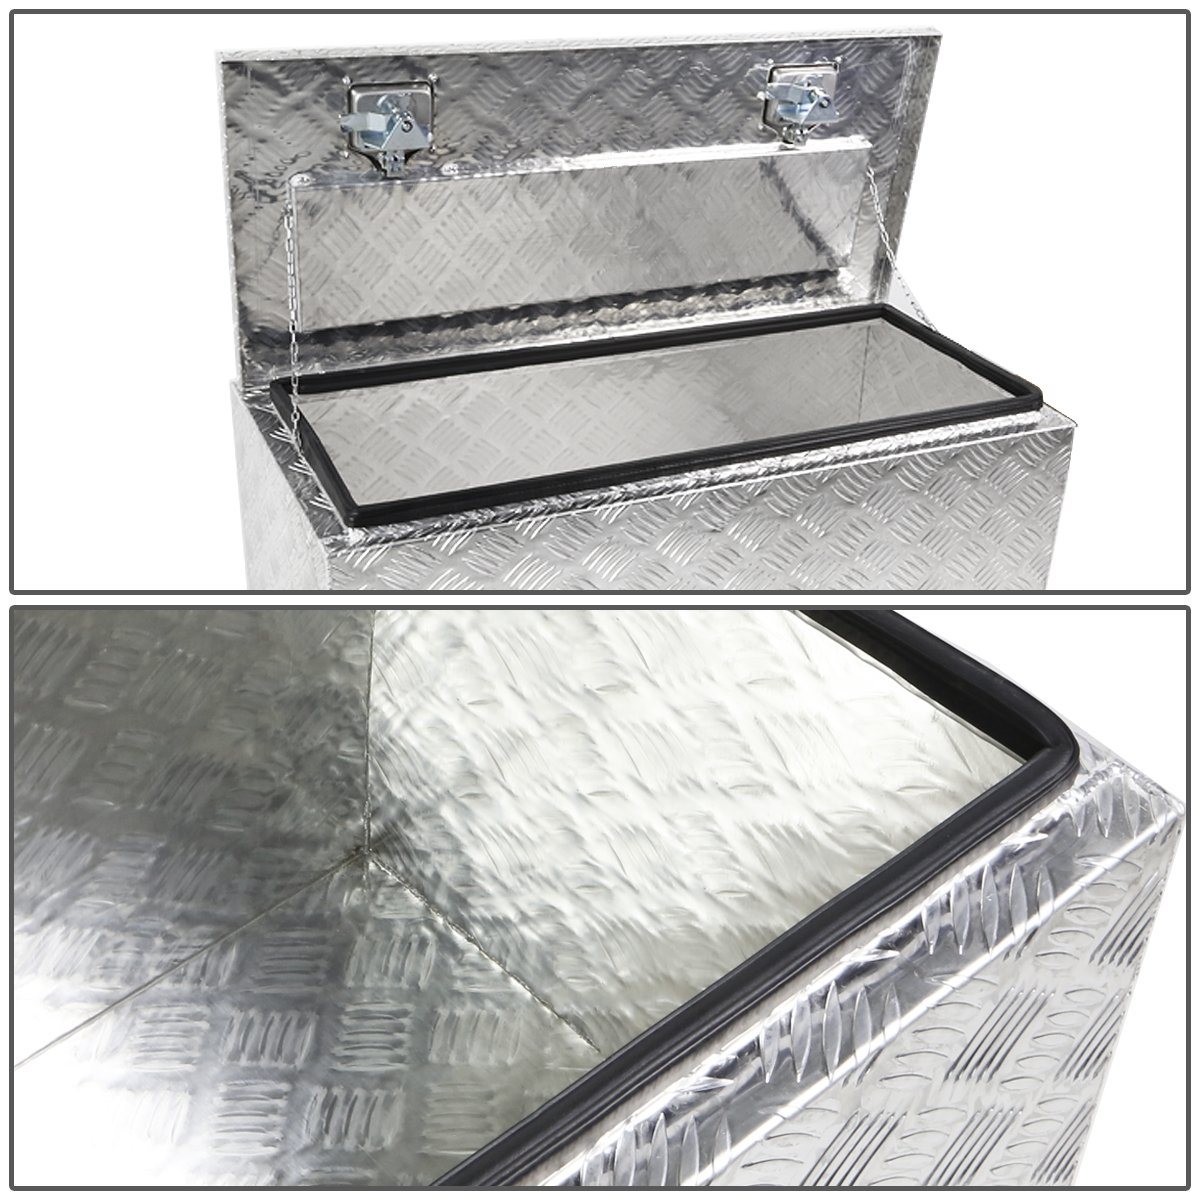 DNA MOTORING TBOX-T2-30-ALU Rear Truck Bed Trailer Key Lock Aluminum Storage Tool Box